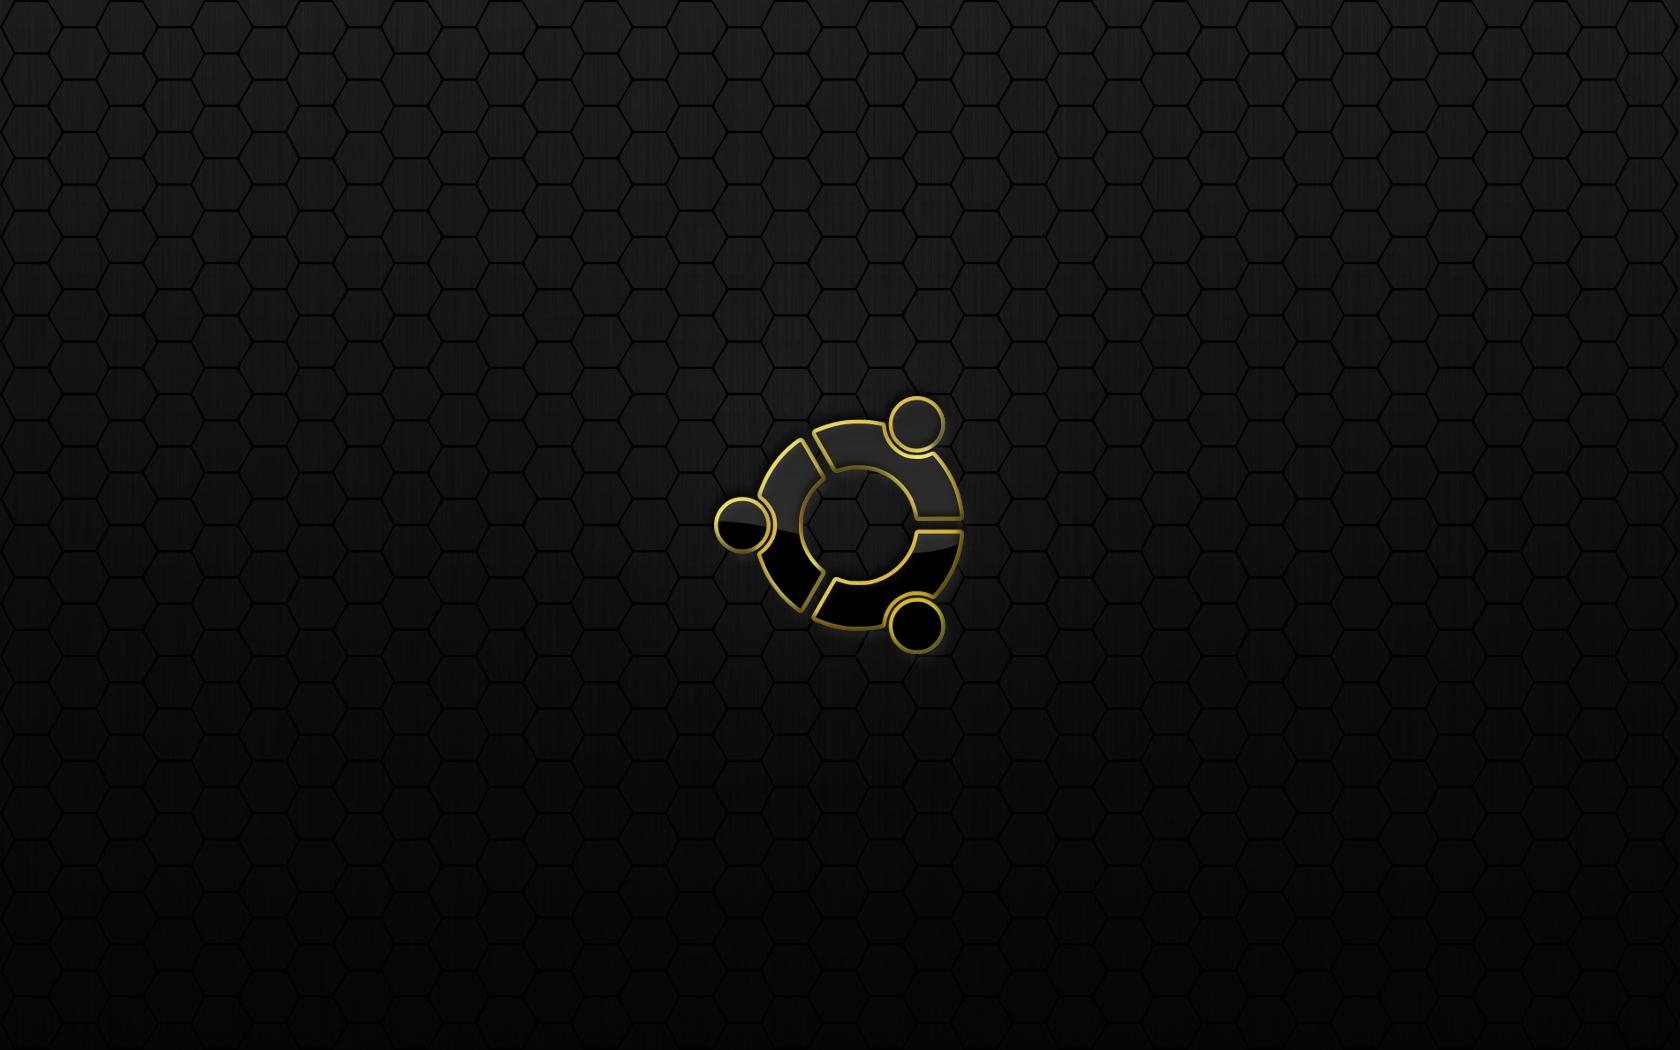 Ubuntu Black Metal Hex by monkeymagico